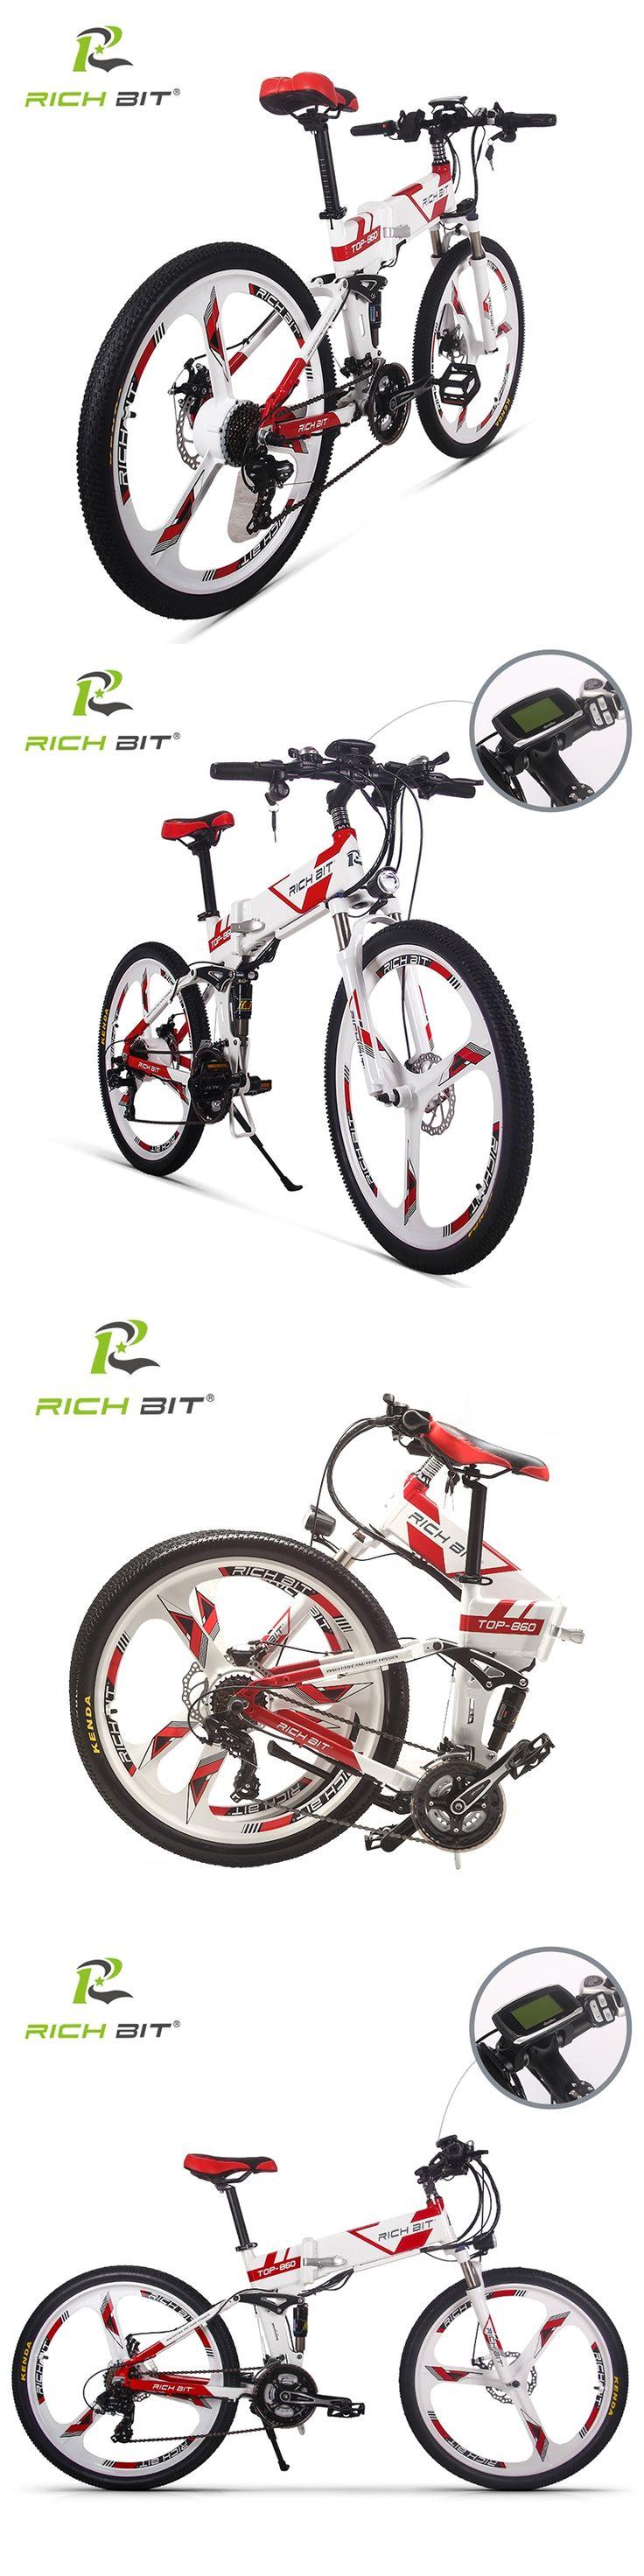 RichBit New 36V*250W Electric Bike Mountain Hybrid MTB Bike Bicycle Cycling Watertight Frame Inside Li-on Battery Folding Ebike